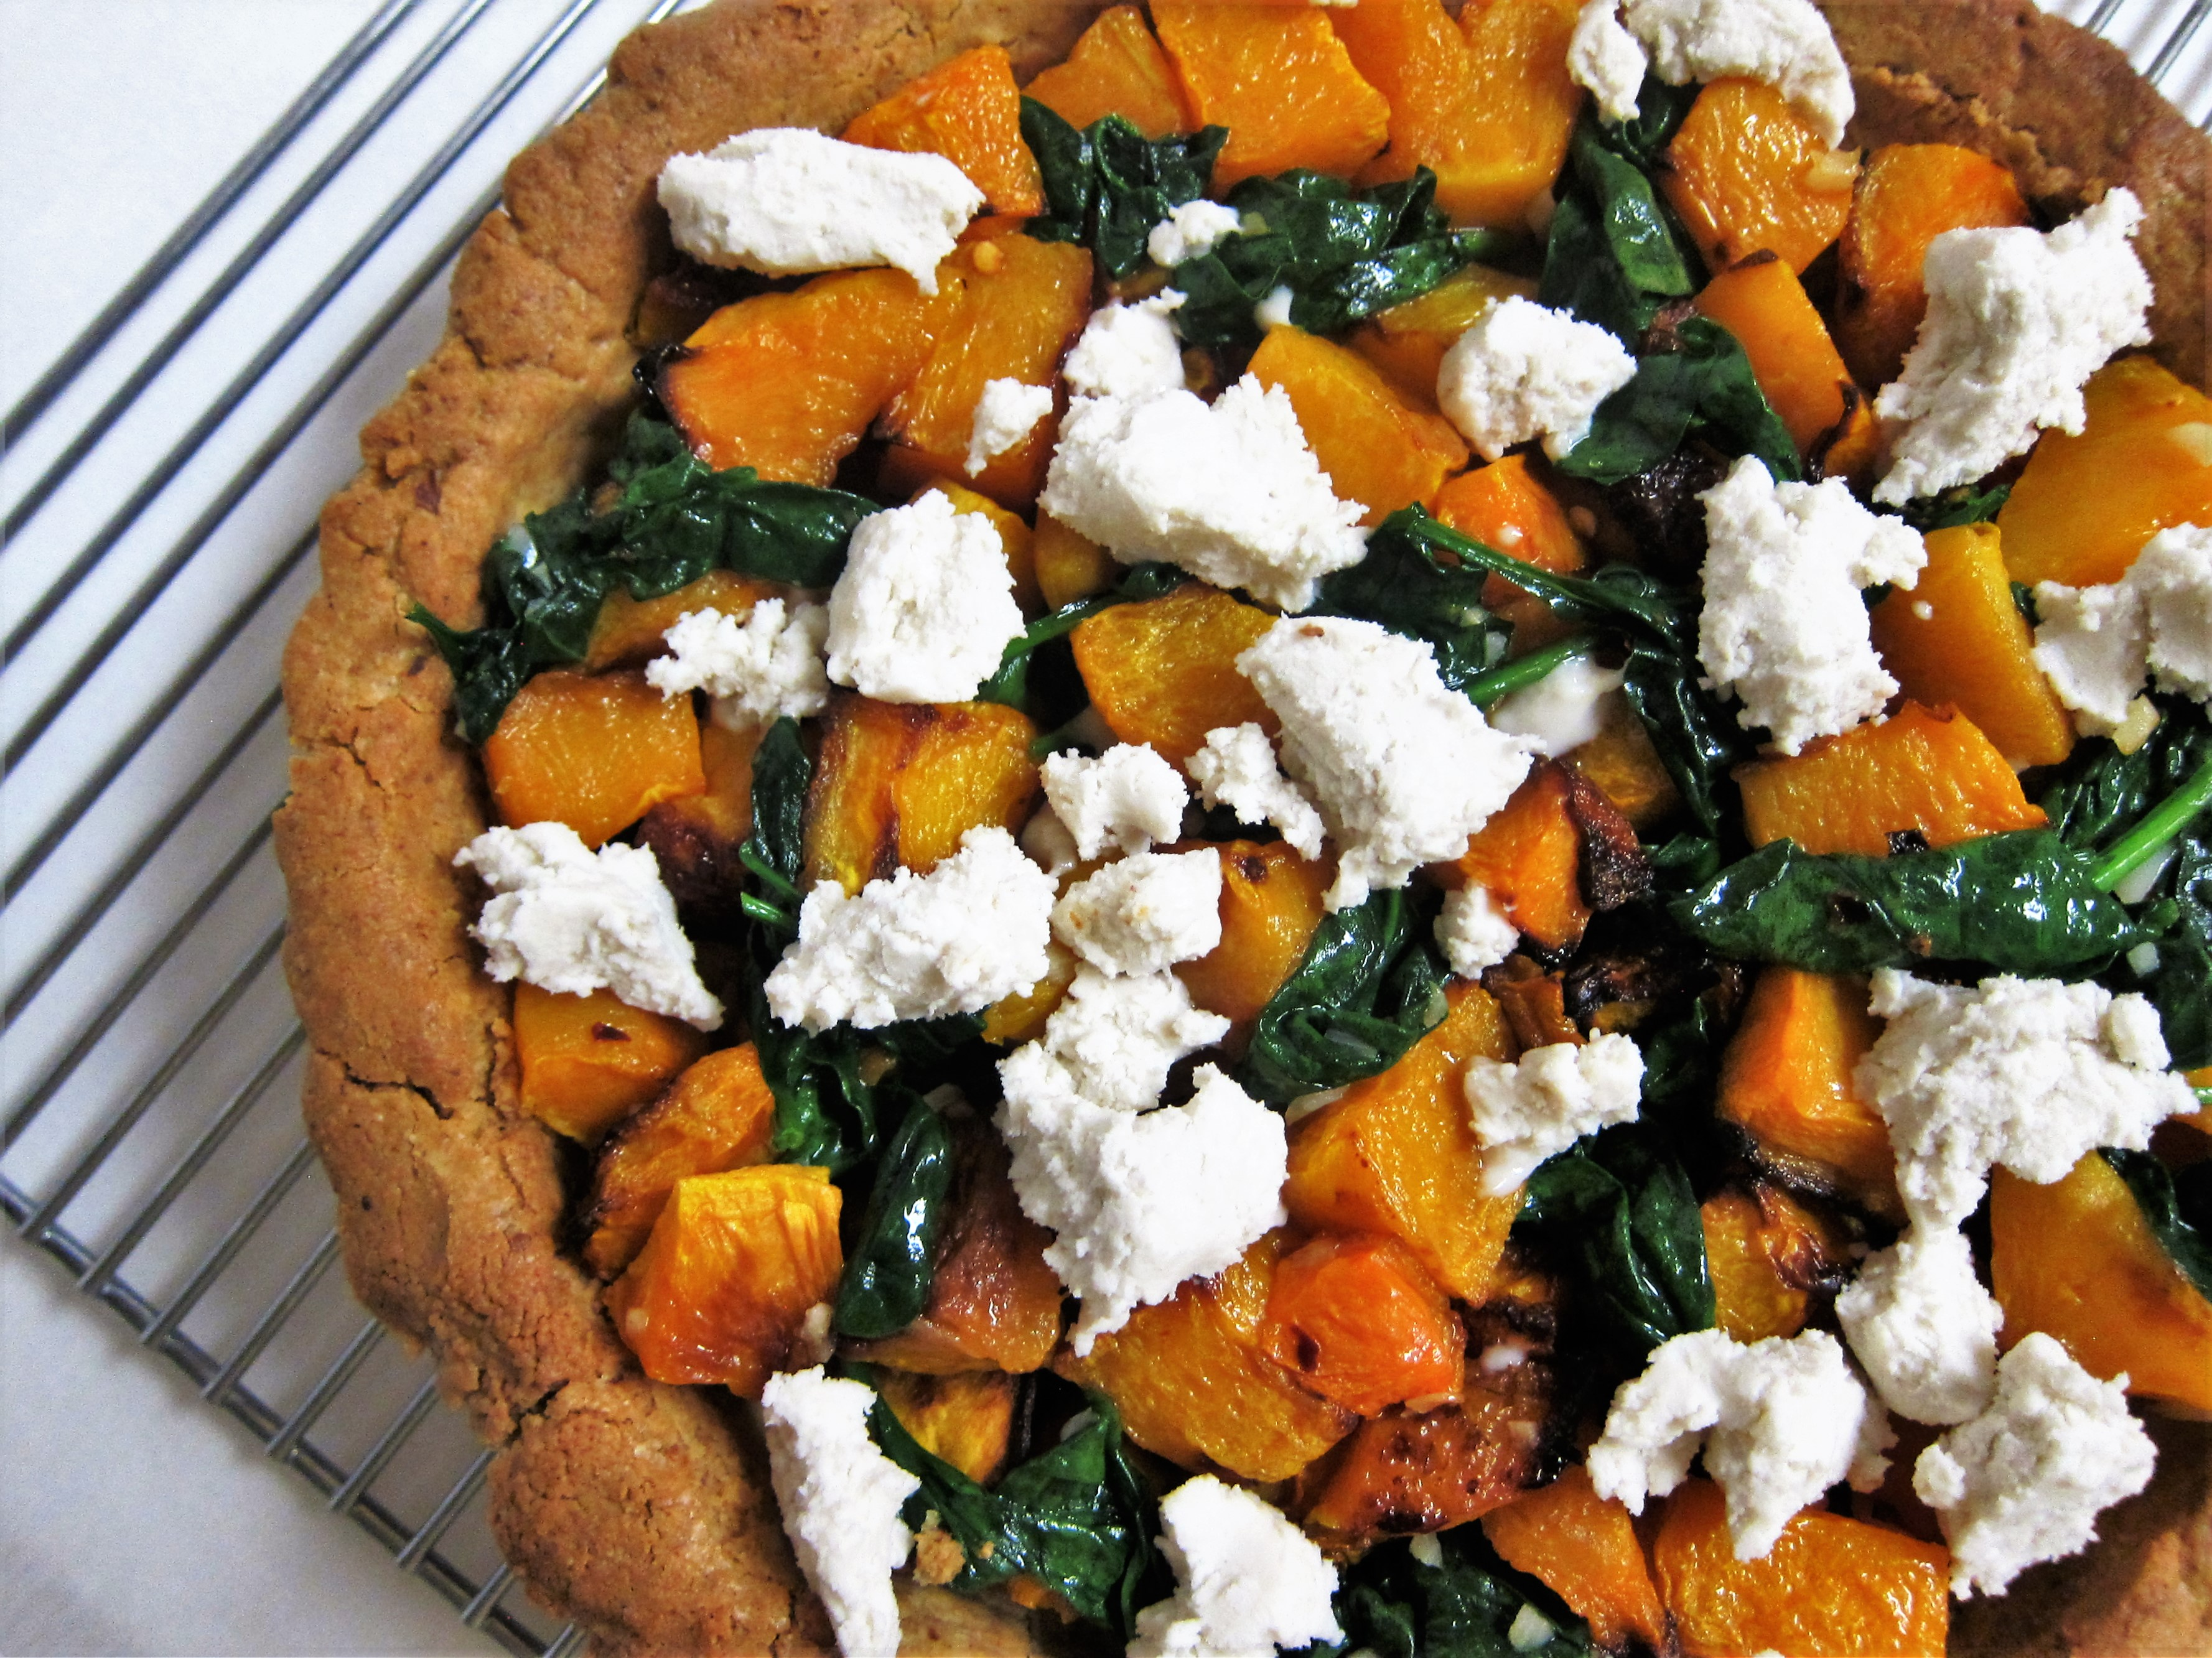 Vegan Roasted Squash and Chevre Tart